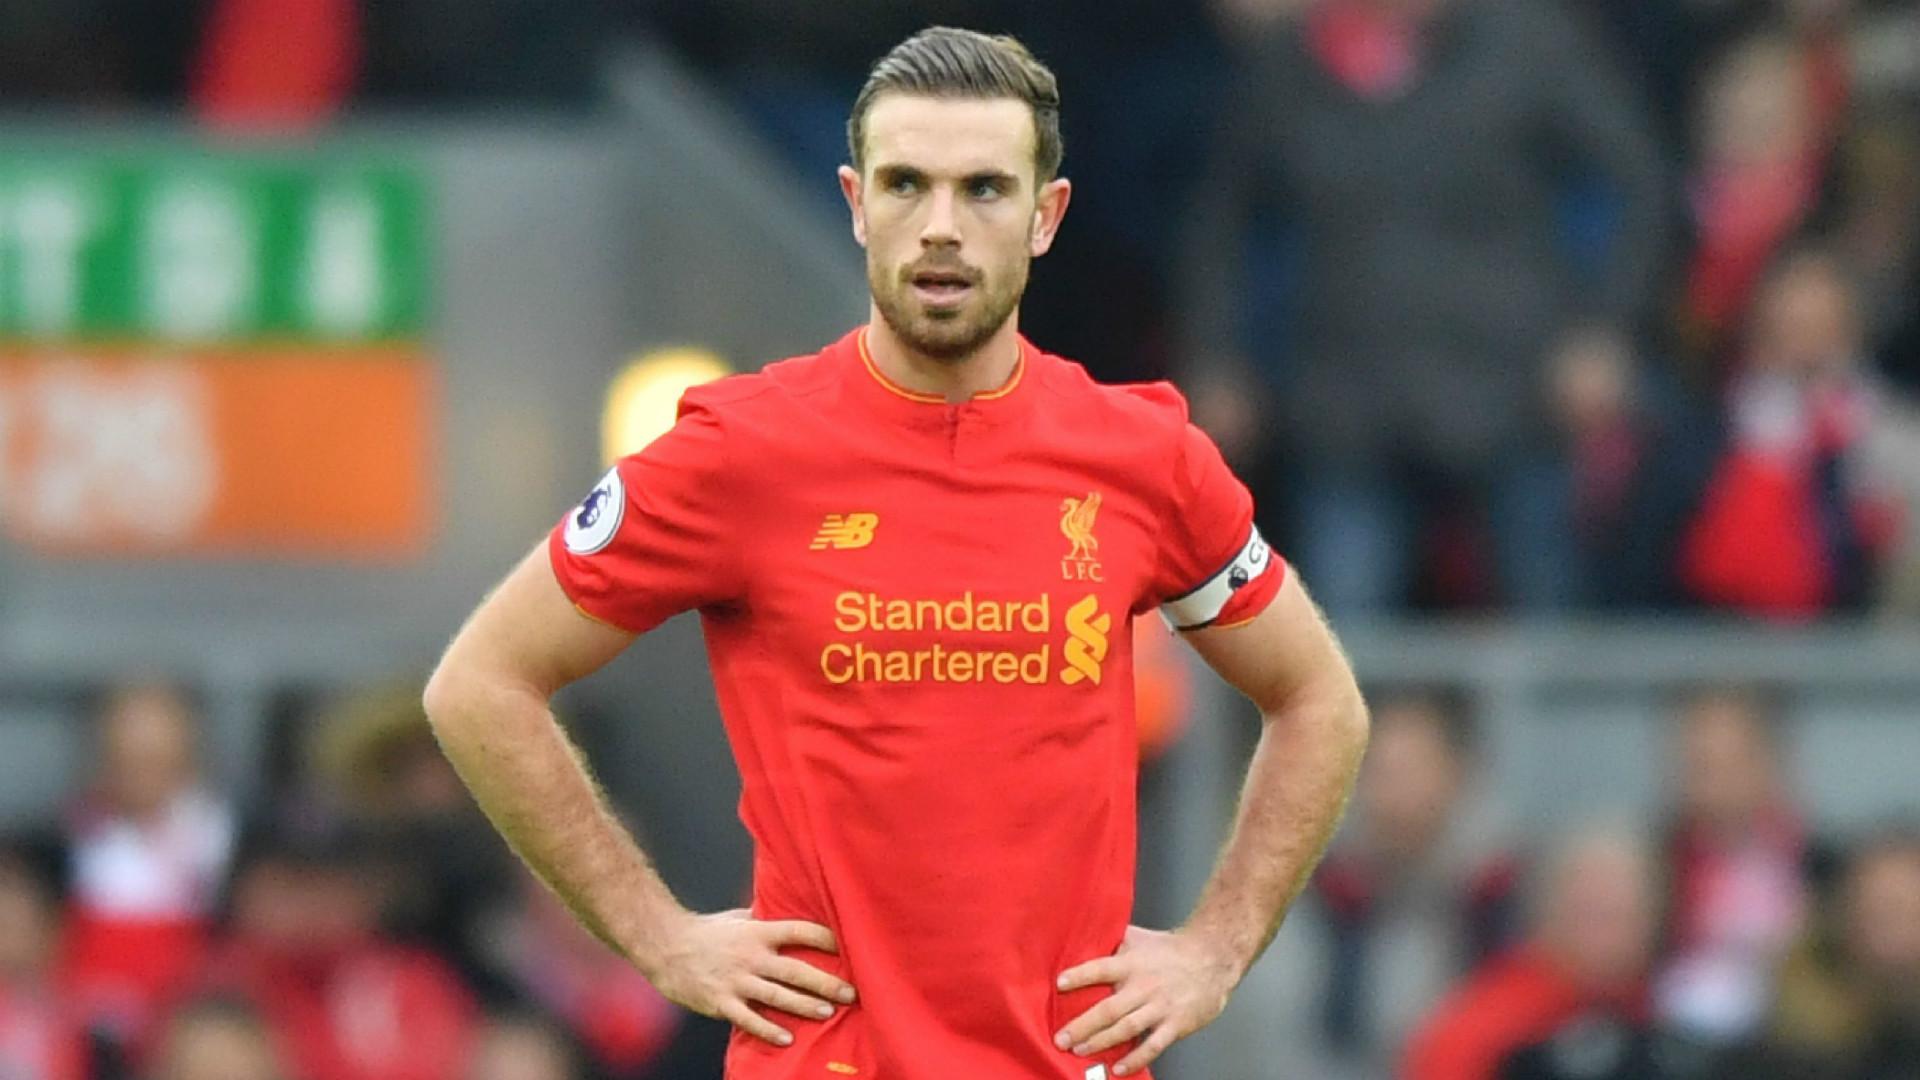 Liverpool Team News: Injuries, suspensions & line-up vs West Ham - Goal